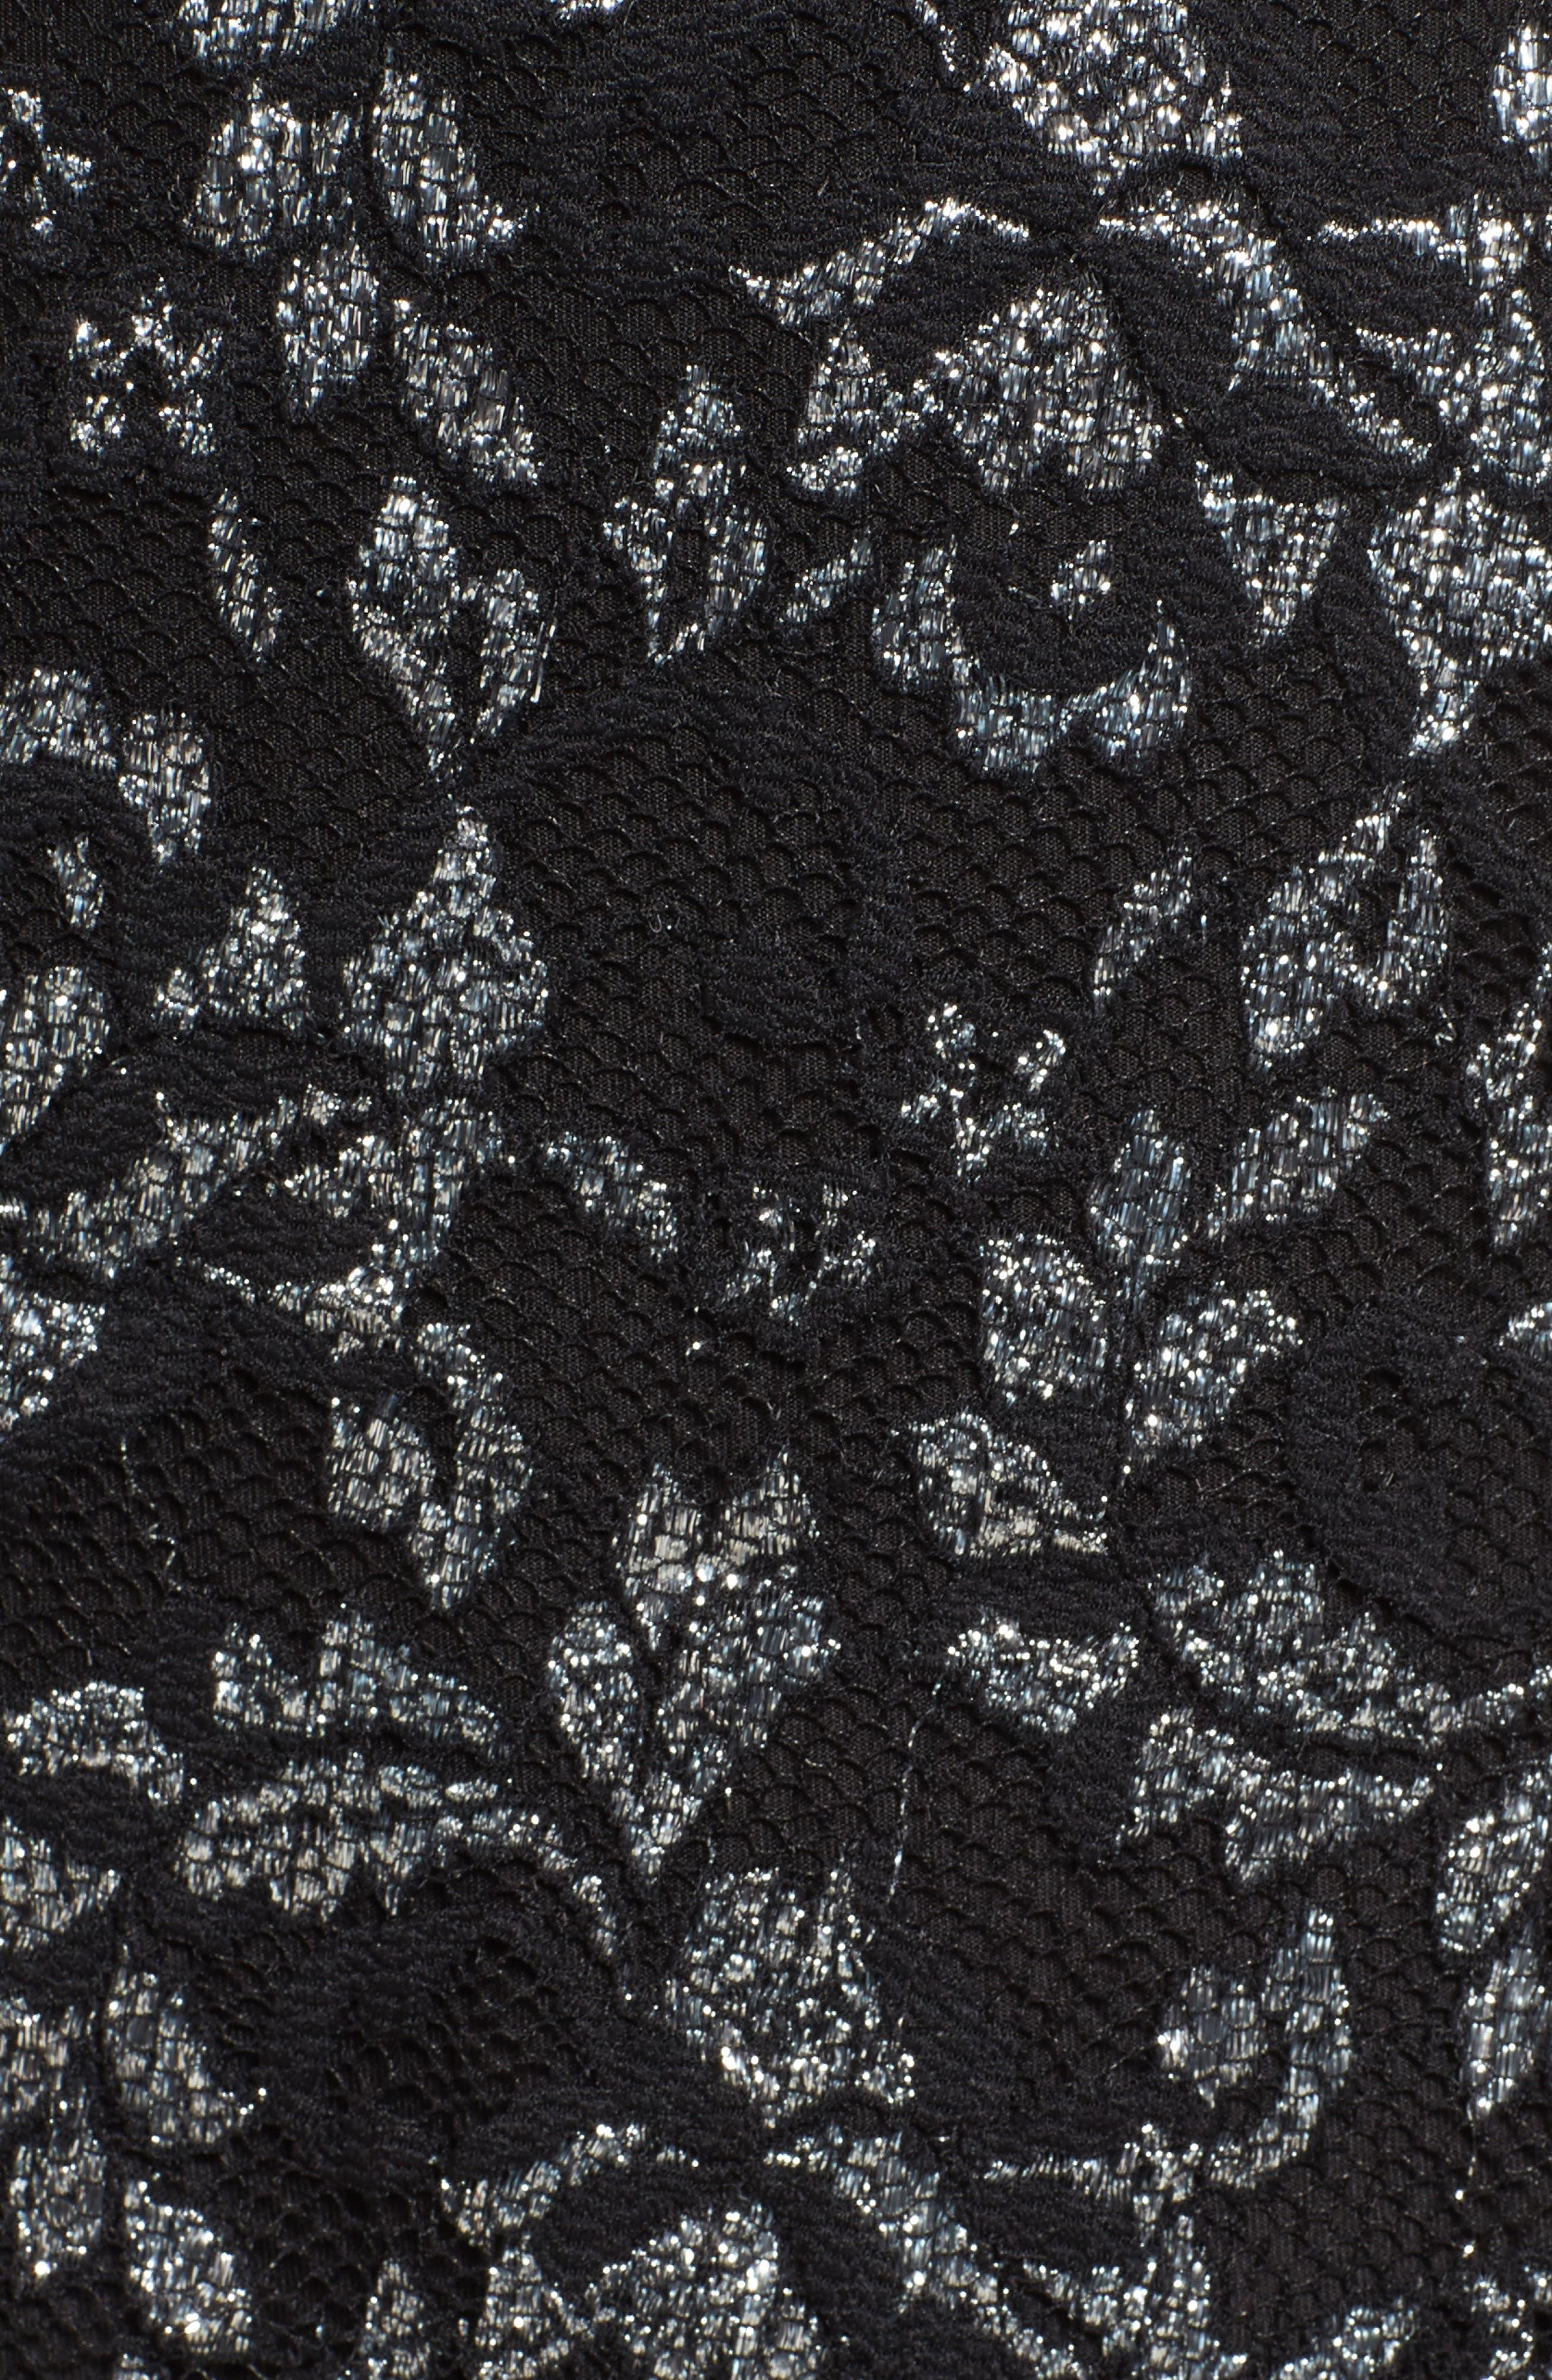 Laney Metallic Lace Wrap Dress,                             Alternate thumbnail 5, color,                             002